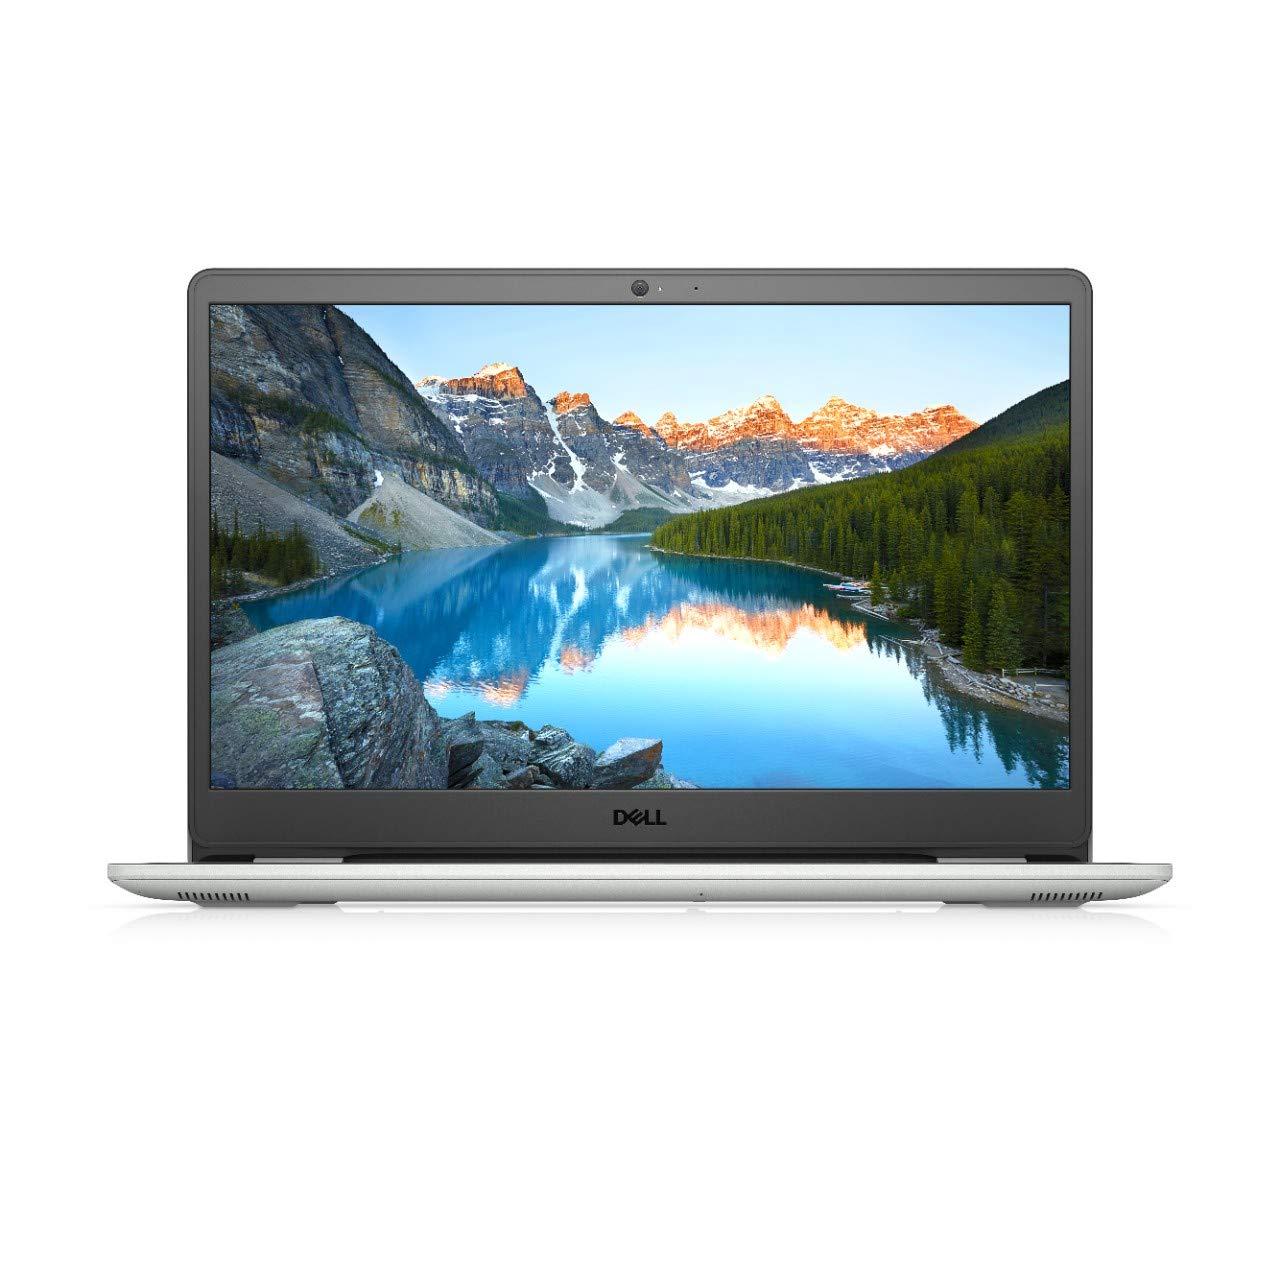 Dell Inspiron 3505 15inch FHD AG Display Laptop (Ryzen-5 3500U / 8GB / 512 SSD / Vega Graphics / 1 Yr NBD Warranty / Win 10 + MS Office H&S 2019 / Soft Mint) D560341WIN9S